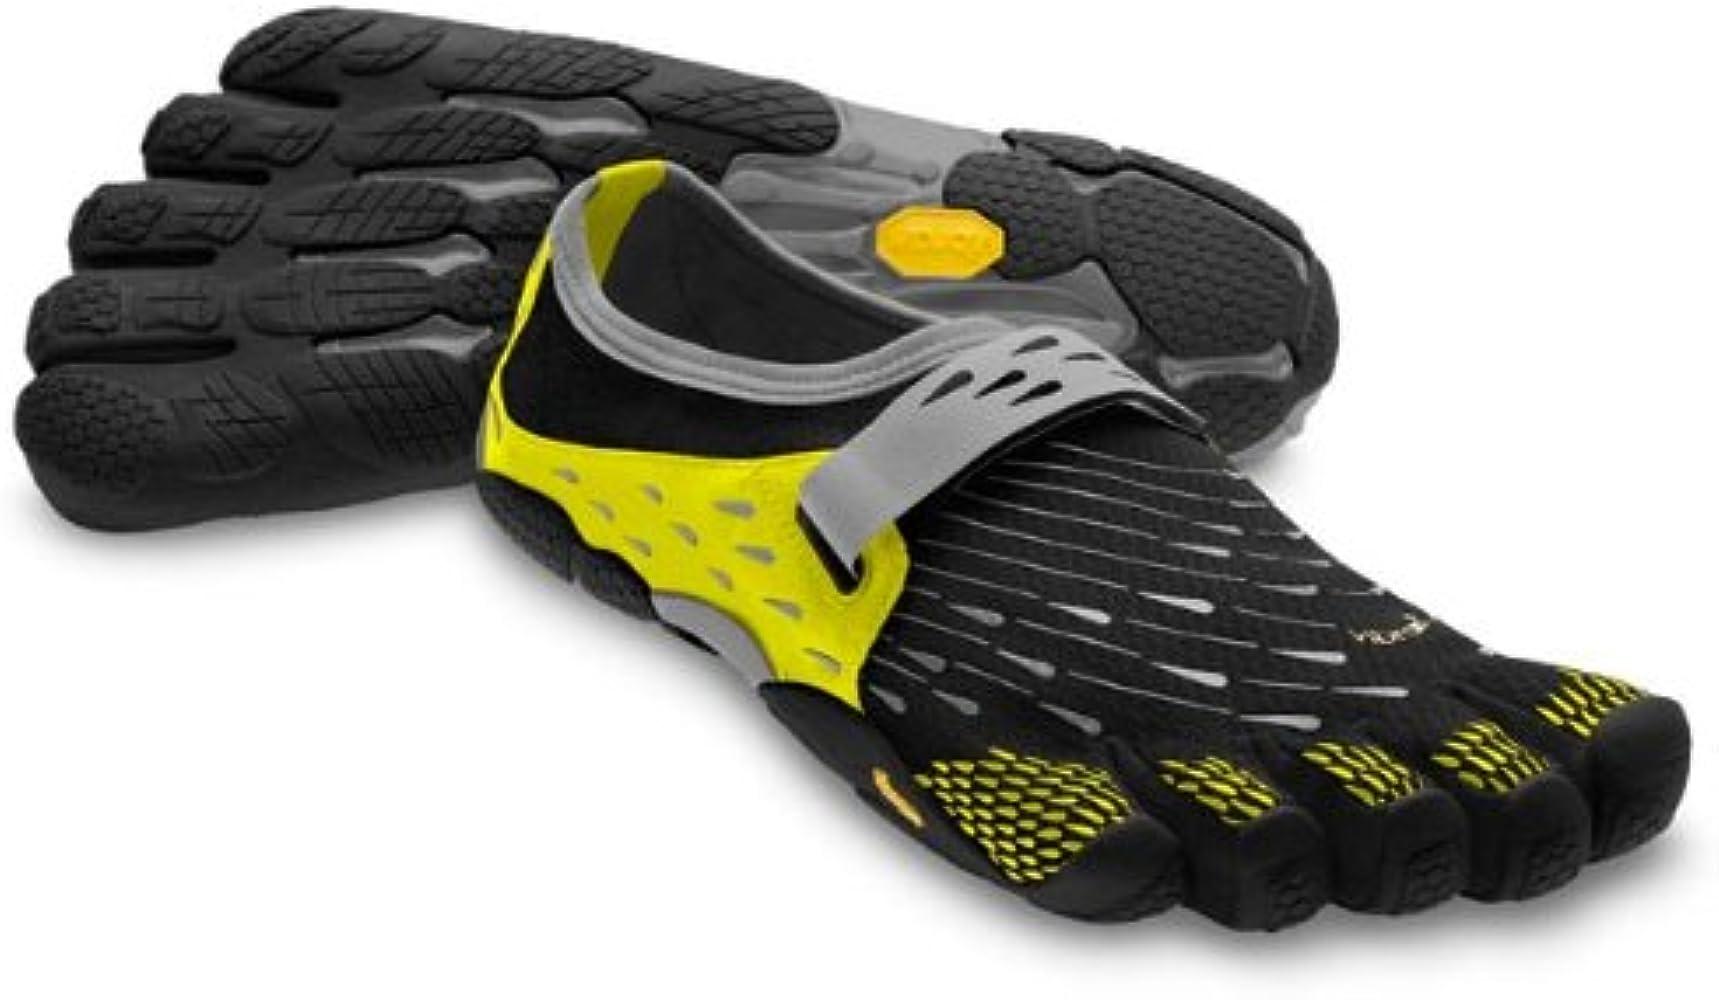 cd1e67c6fc790 Men's M Seeya Black/Yellow Mesh Running-Shoes EU 41 / UK 07 7.5 D(M) US